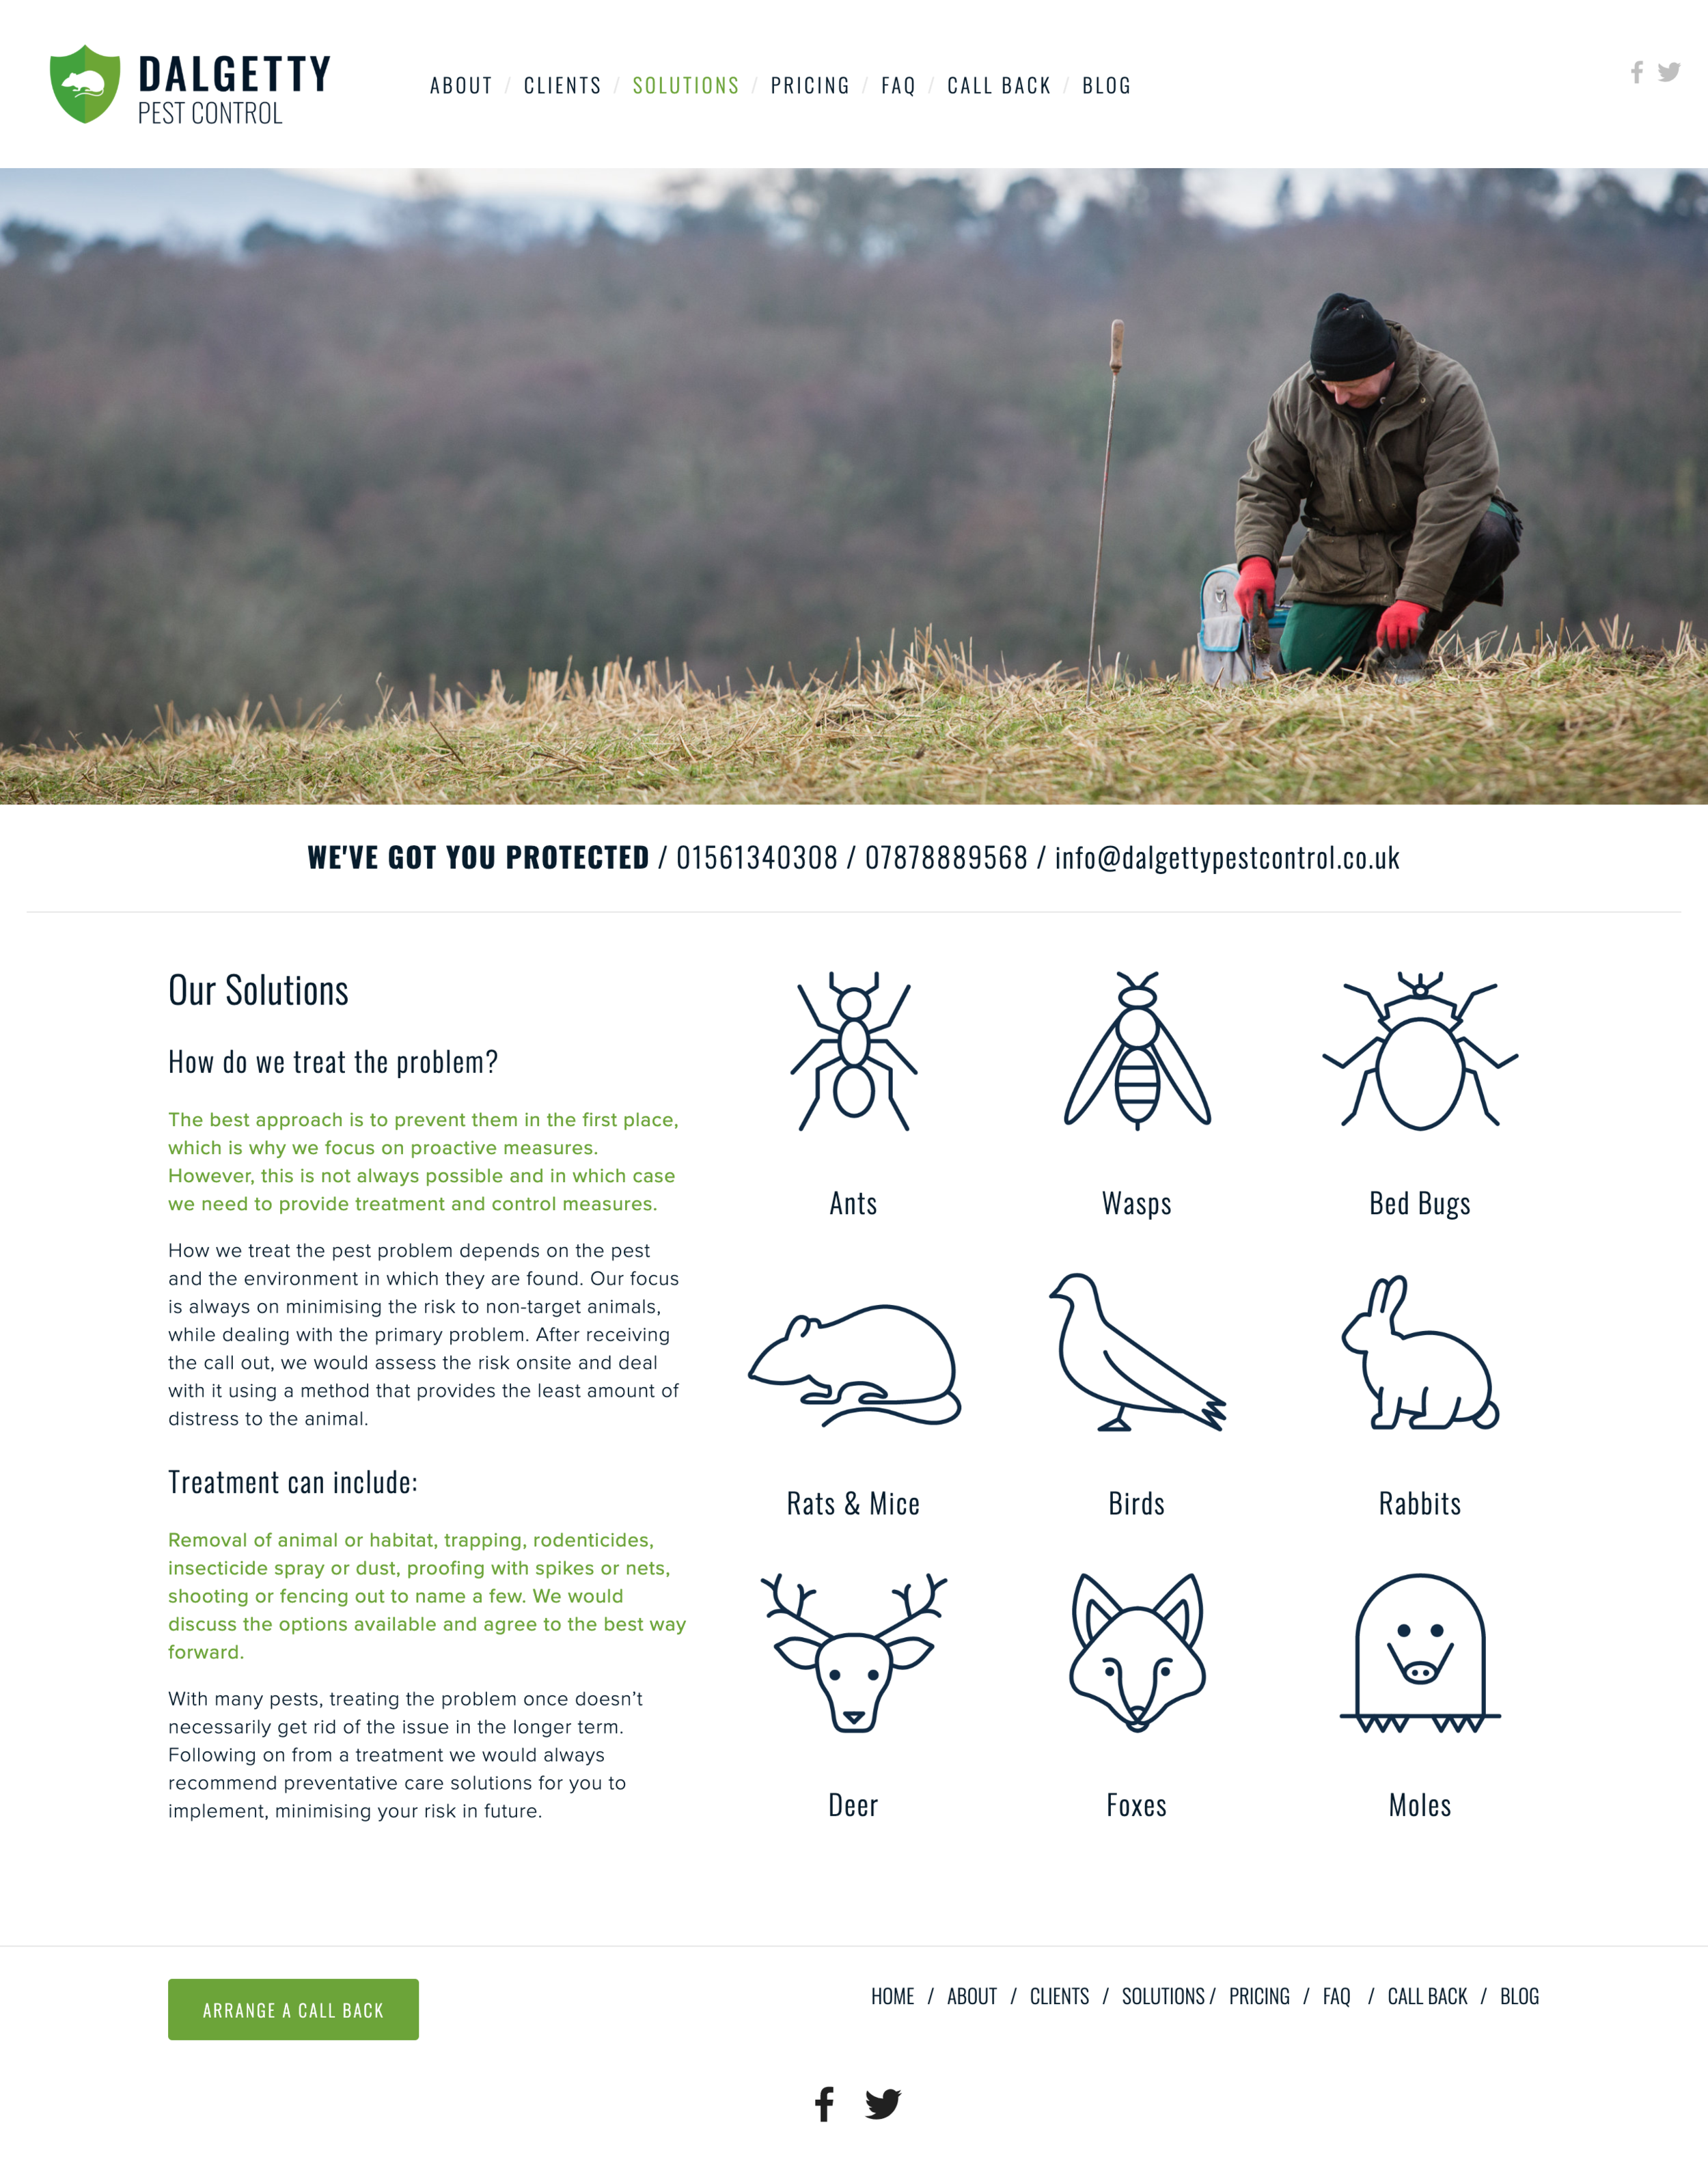 Marketing-web-deisgn-montrose-dalgetty-pest-control